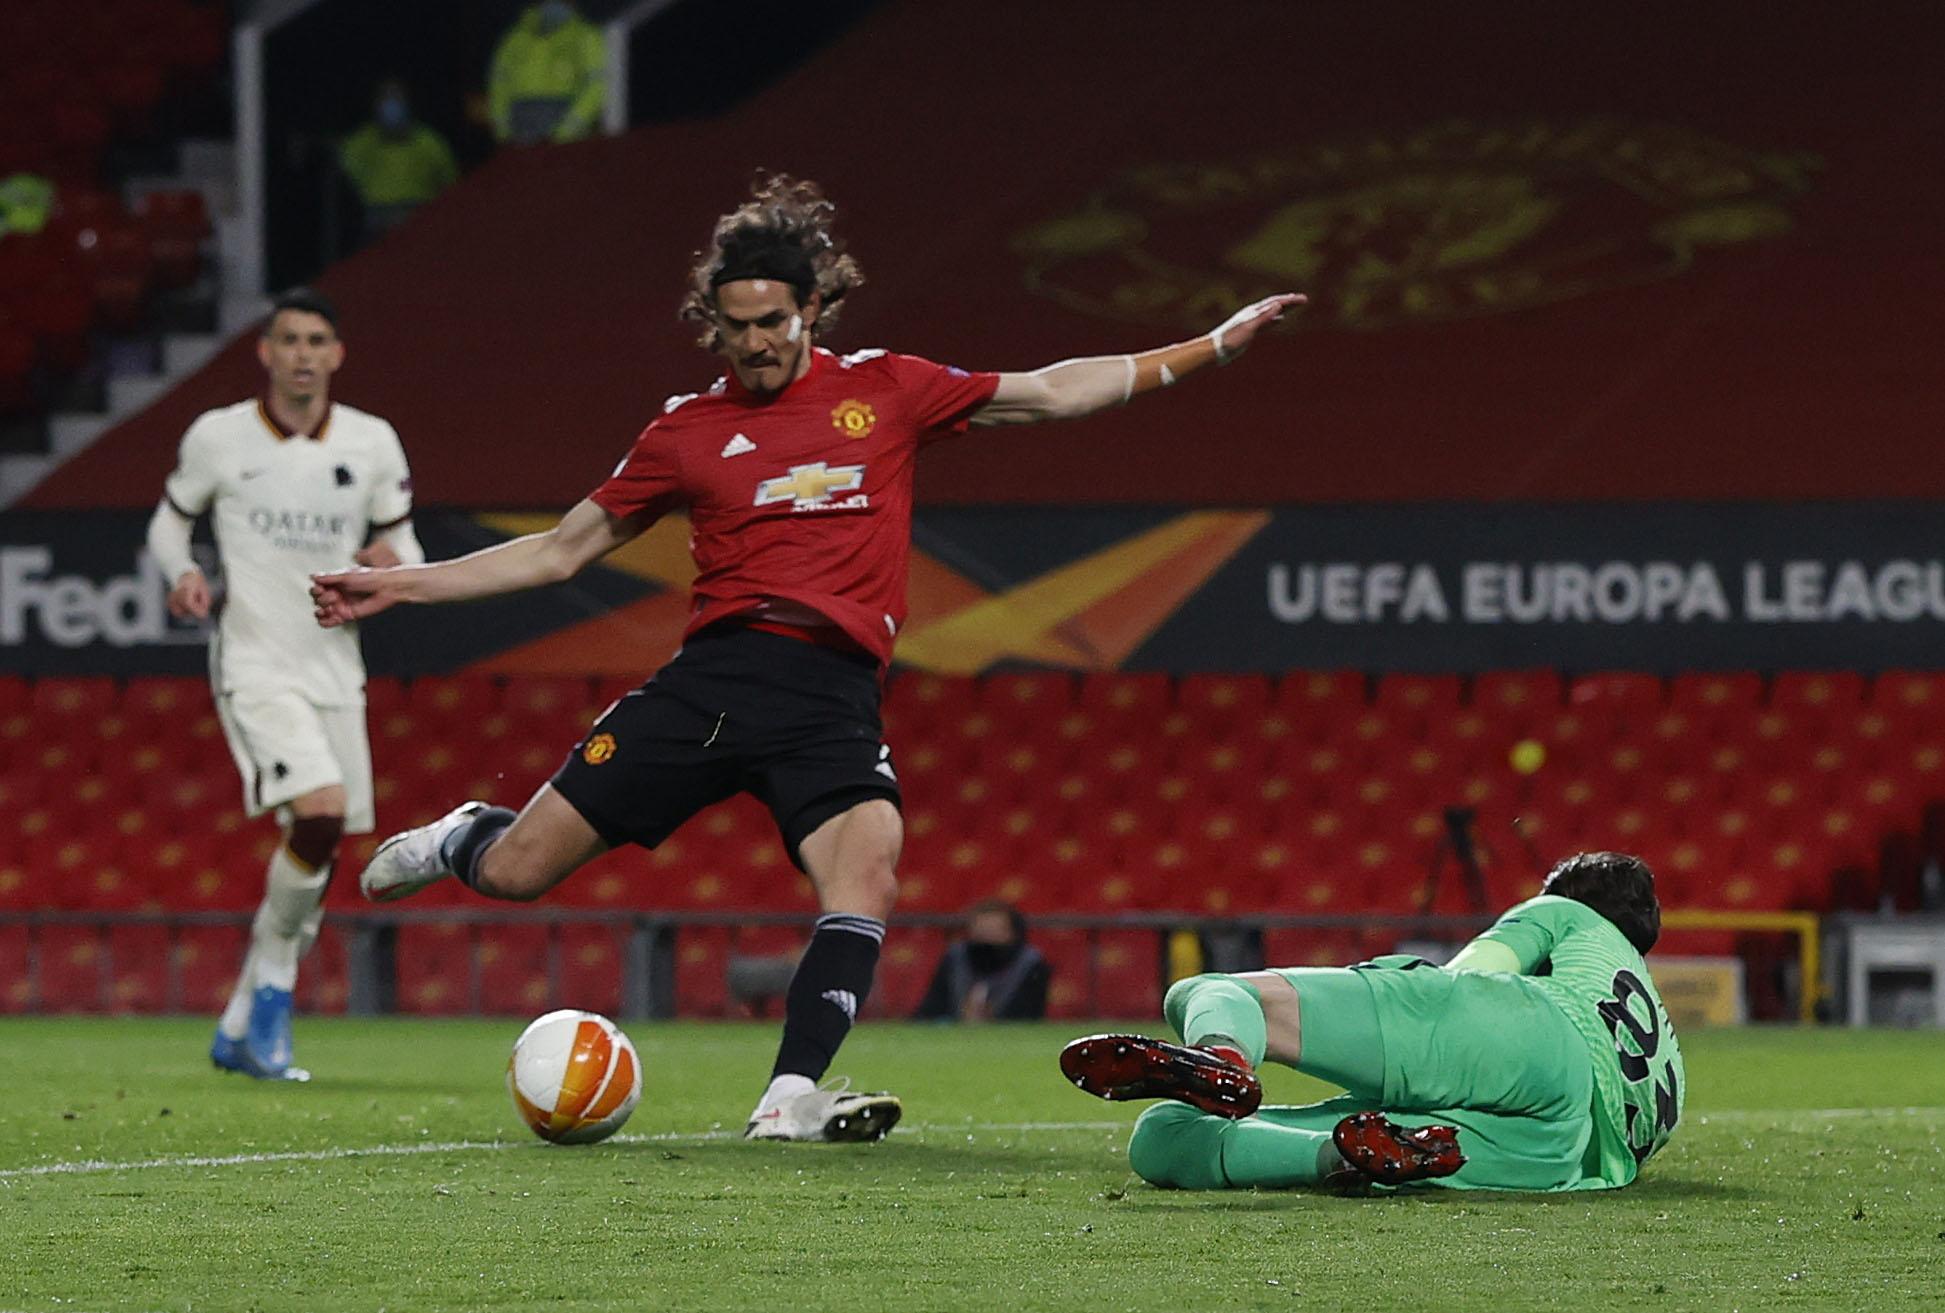 Cavani membawa temperamen dan keberanian seorang juara - sesuatu yang tidak dimiliki oleh banyak pemain muda Man Utd.  Foto: Reuters